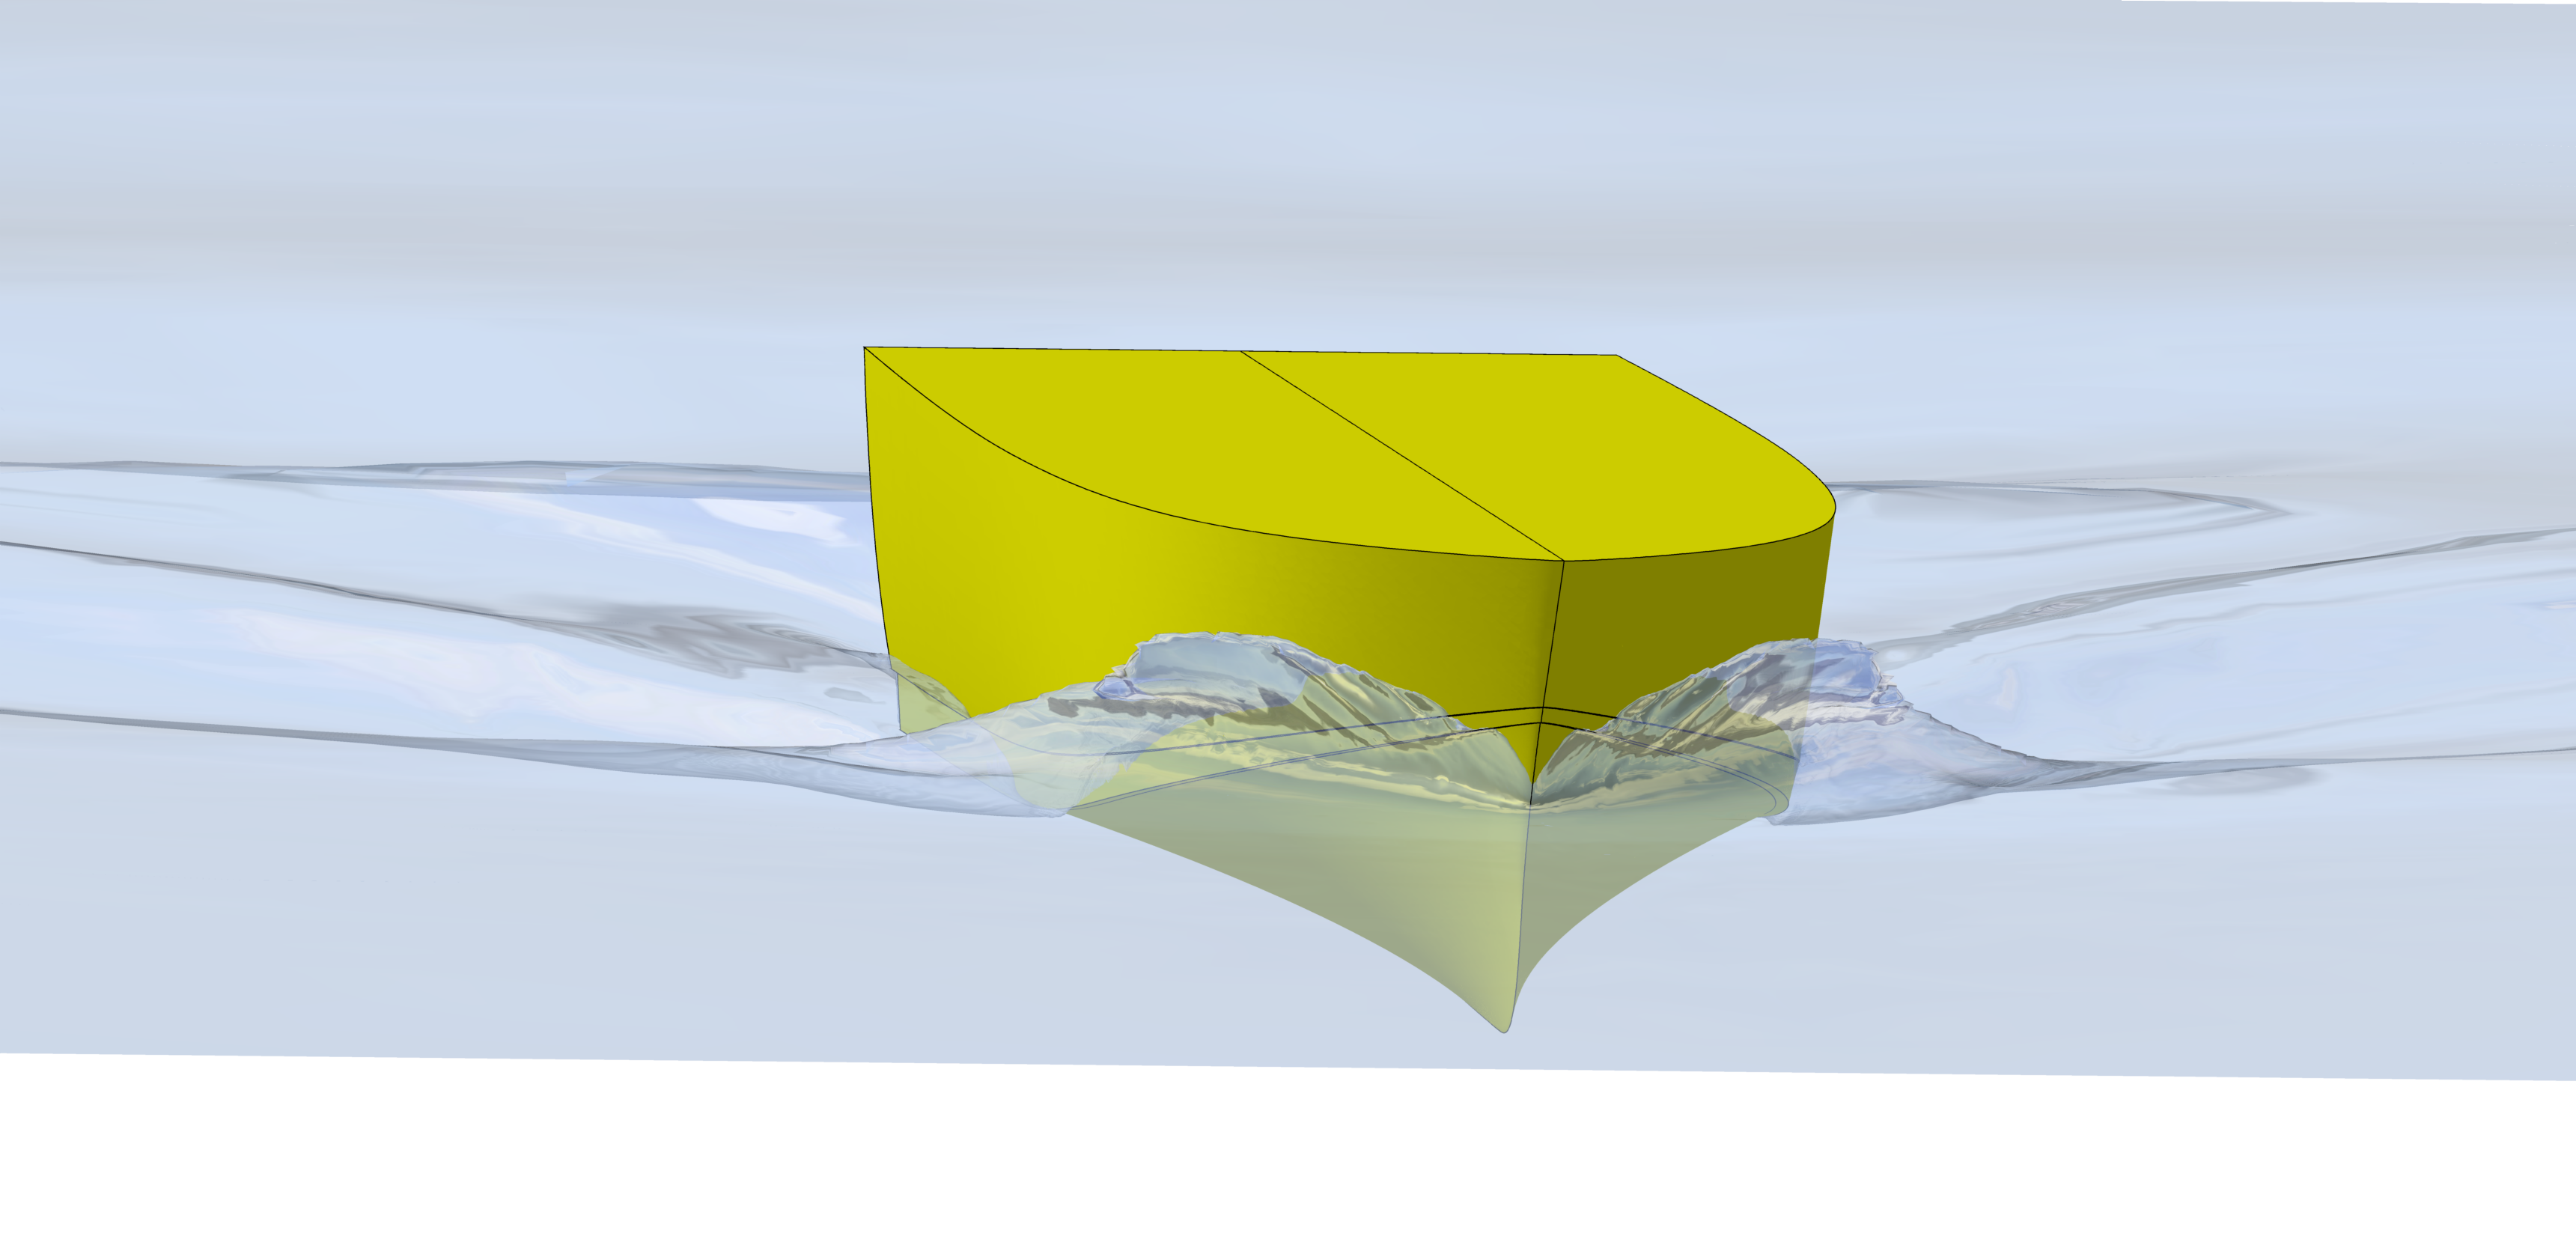 fr044_hull_2_wave